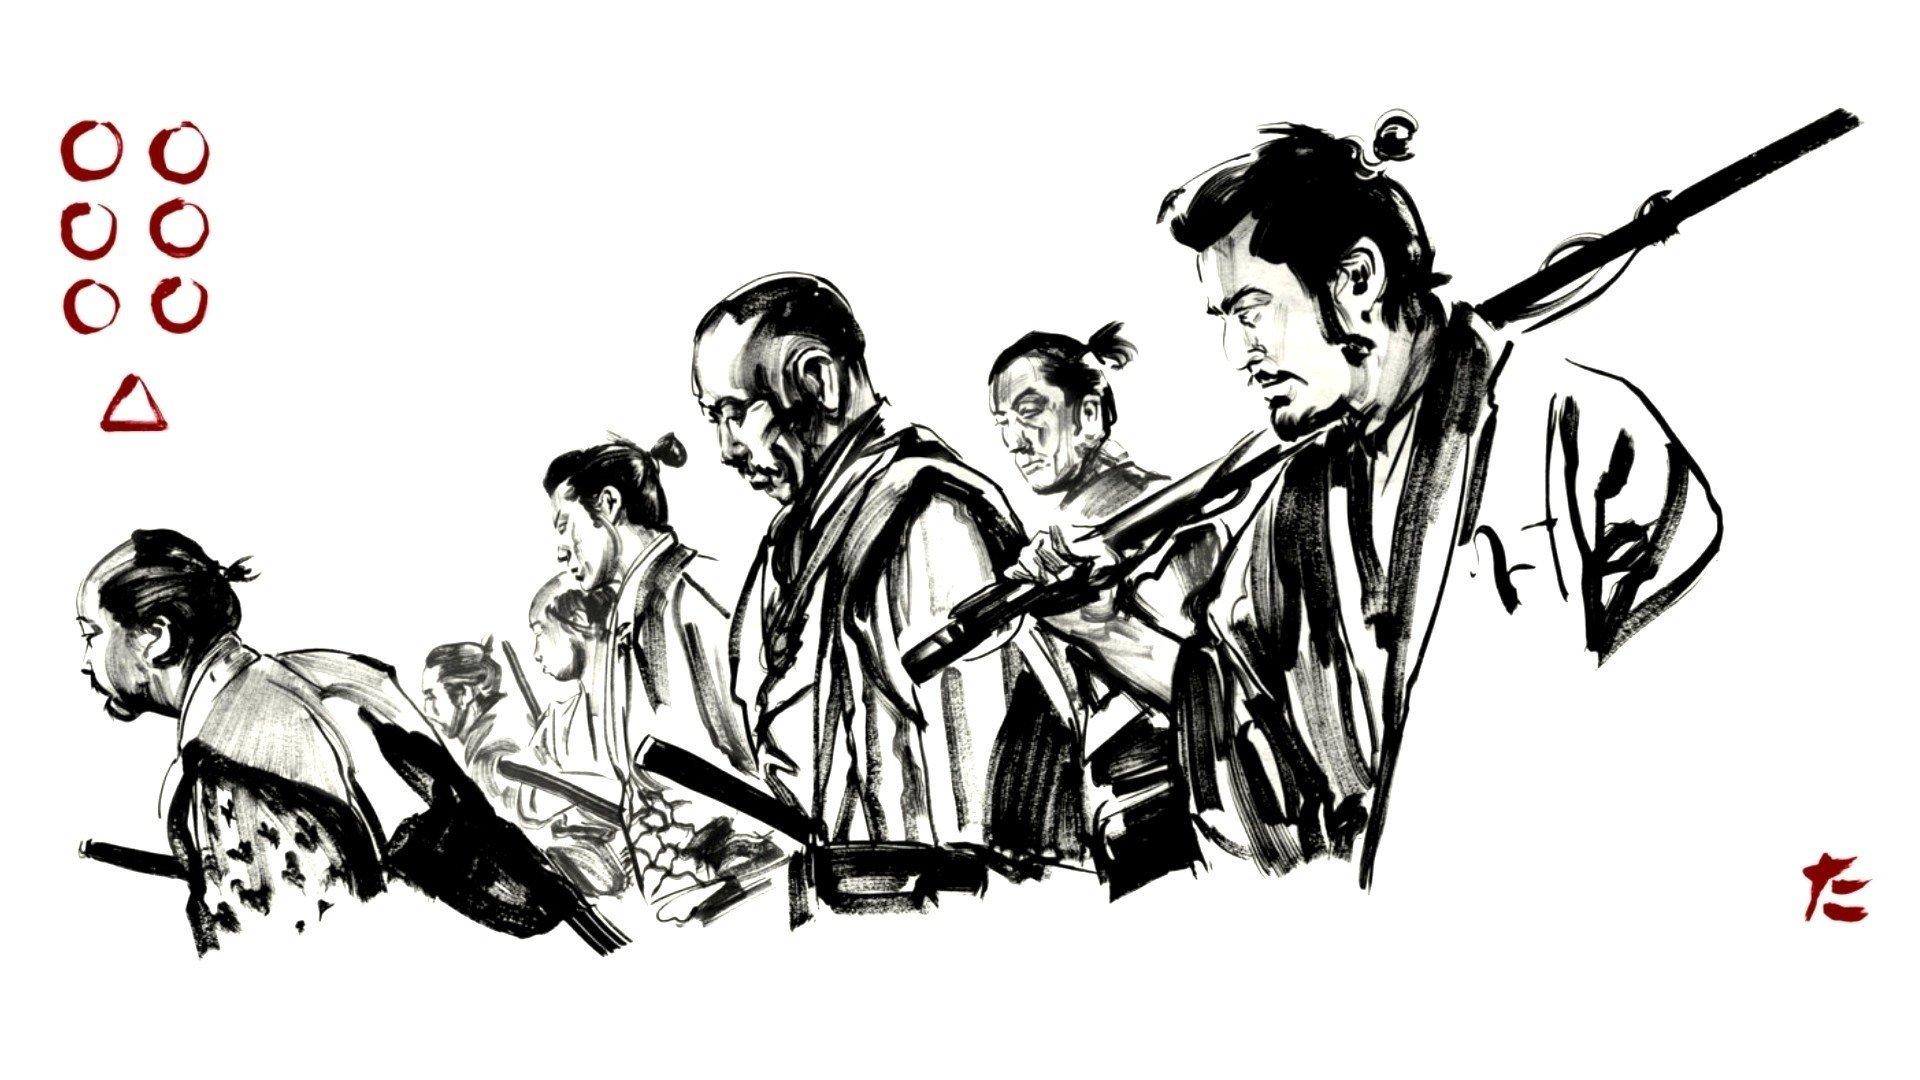 Arte visual de 'Los siete samuráis'